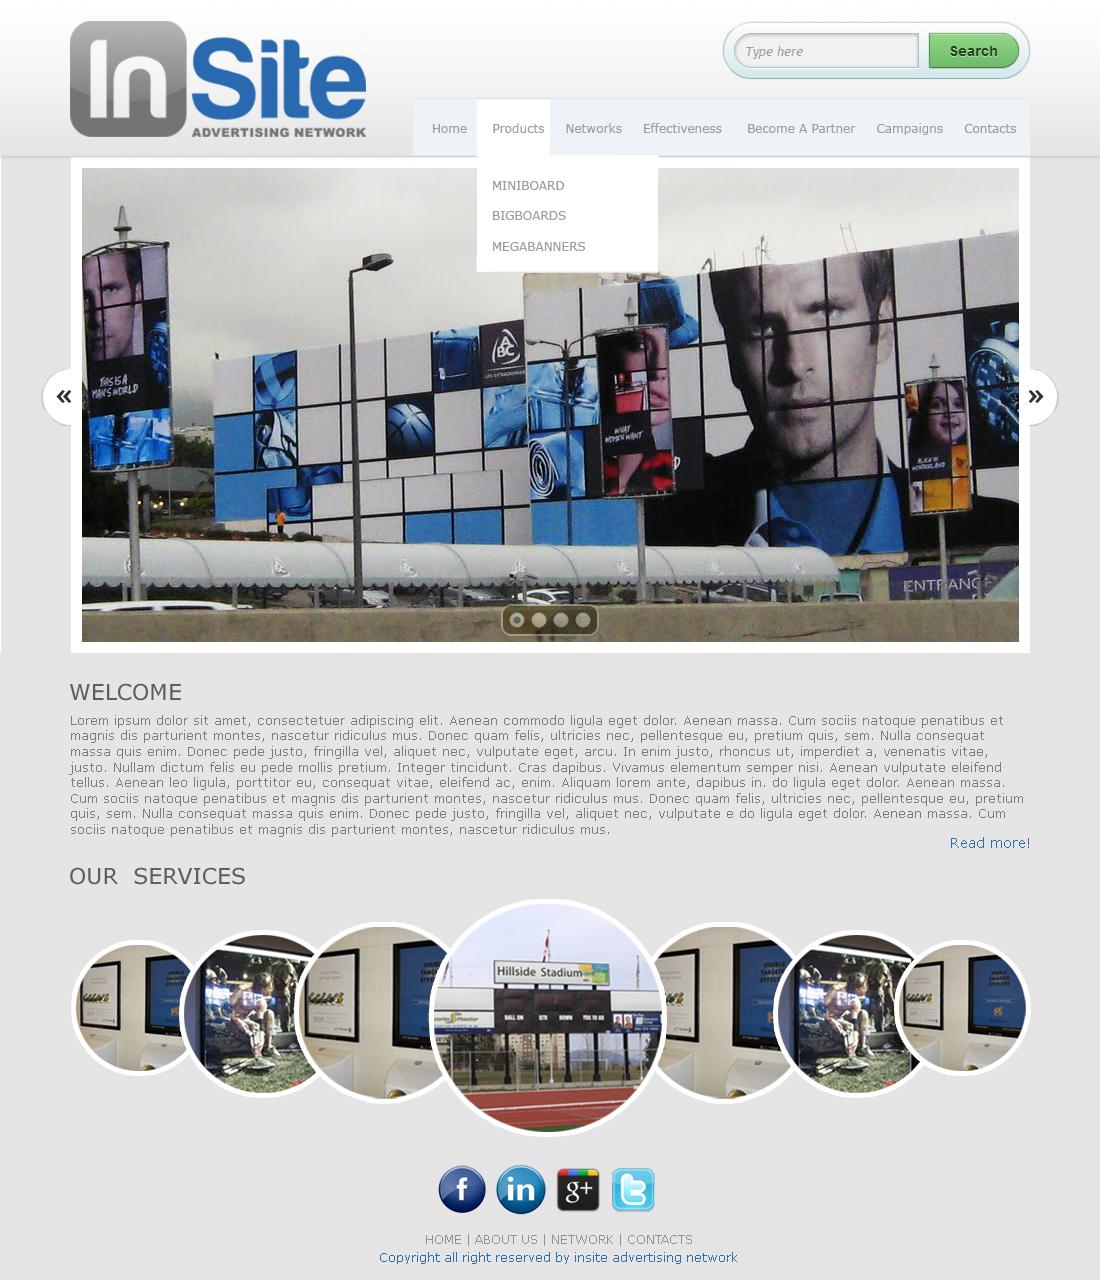 Modern Bold Advertising Web Design For A Company By Mak Grg Design 1065466